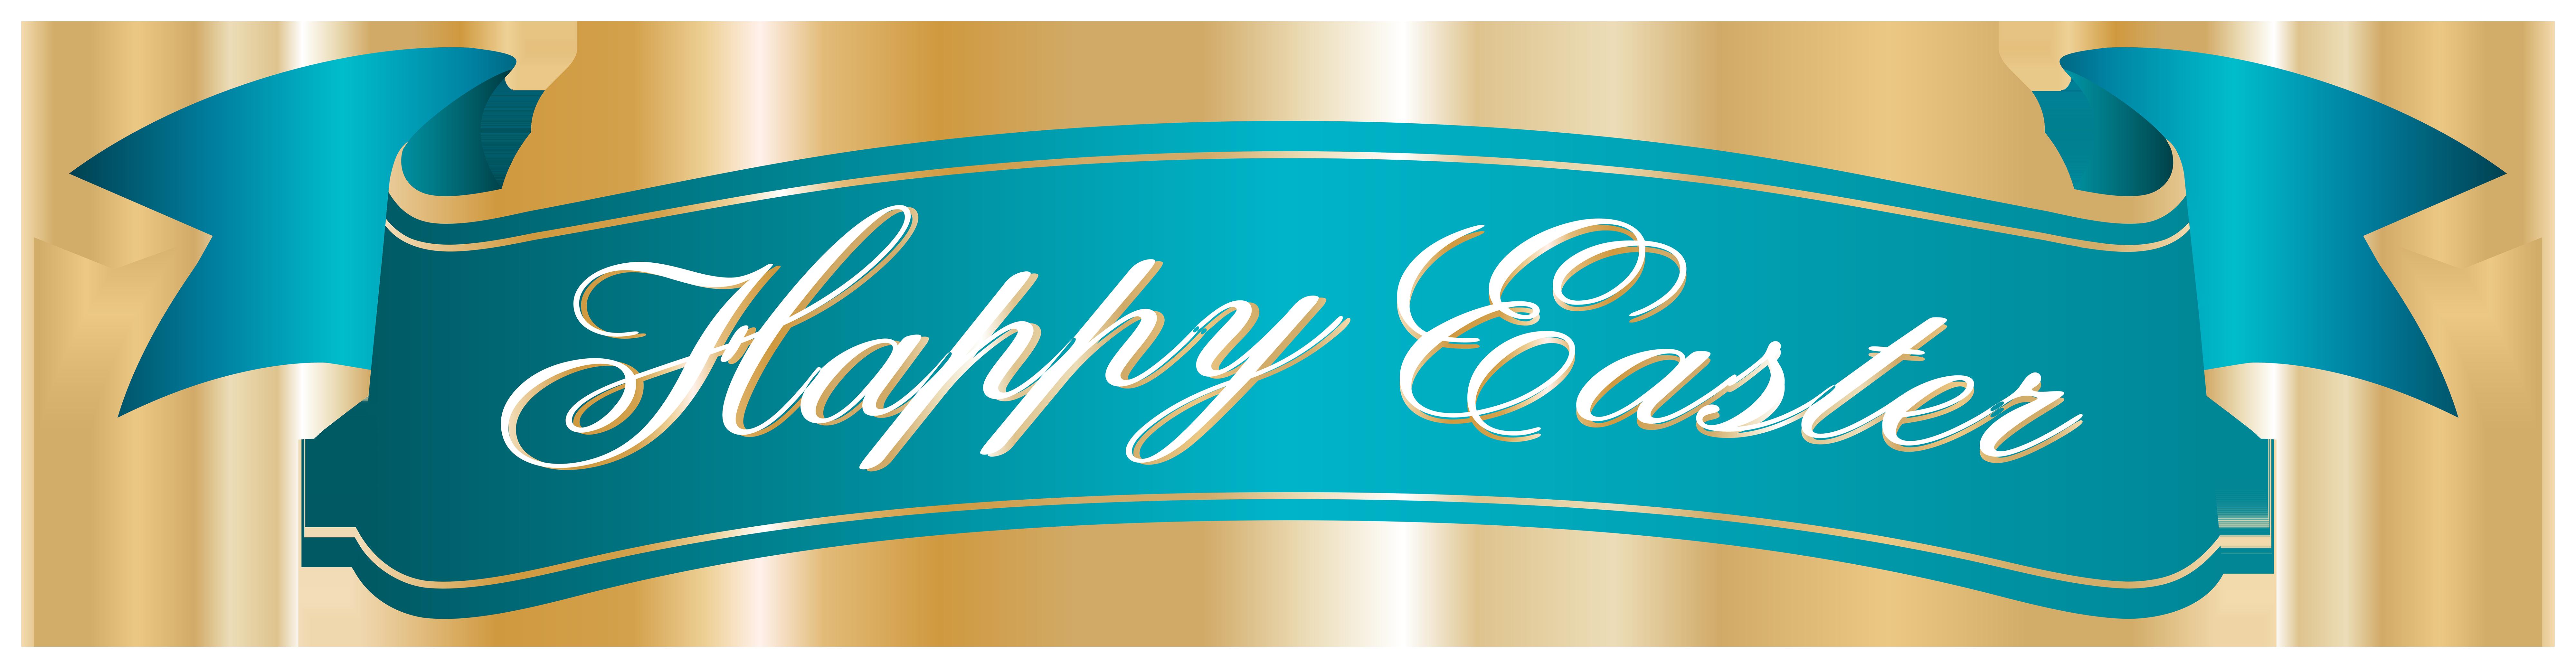 Happy Easter Banner PNG Clip Art Image.